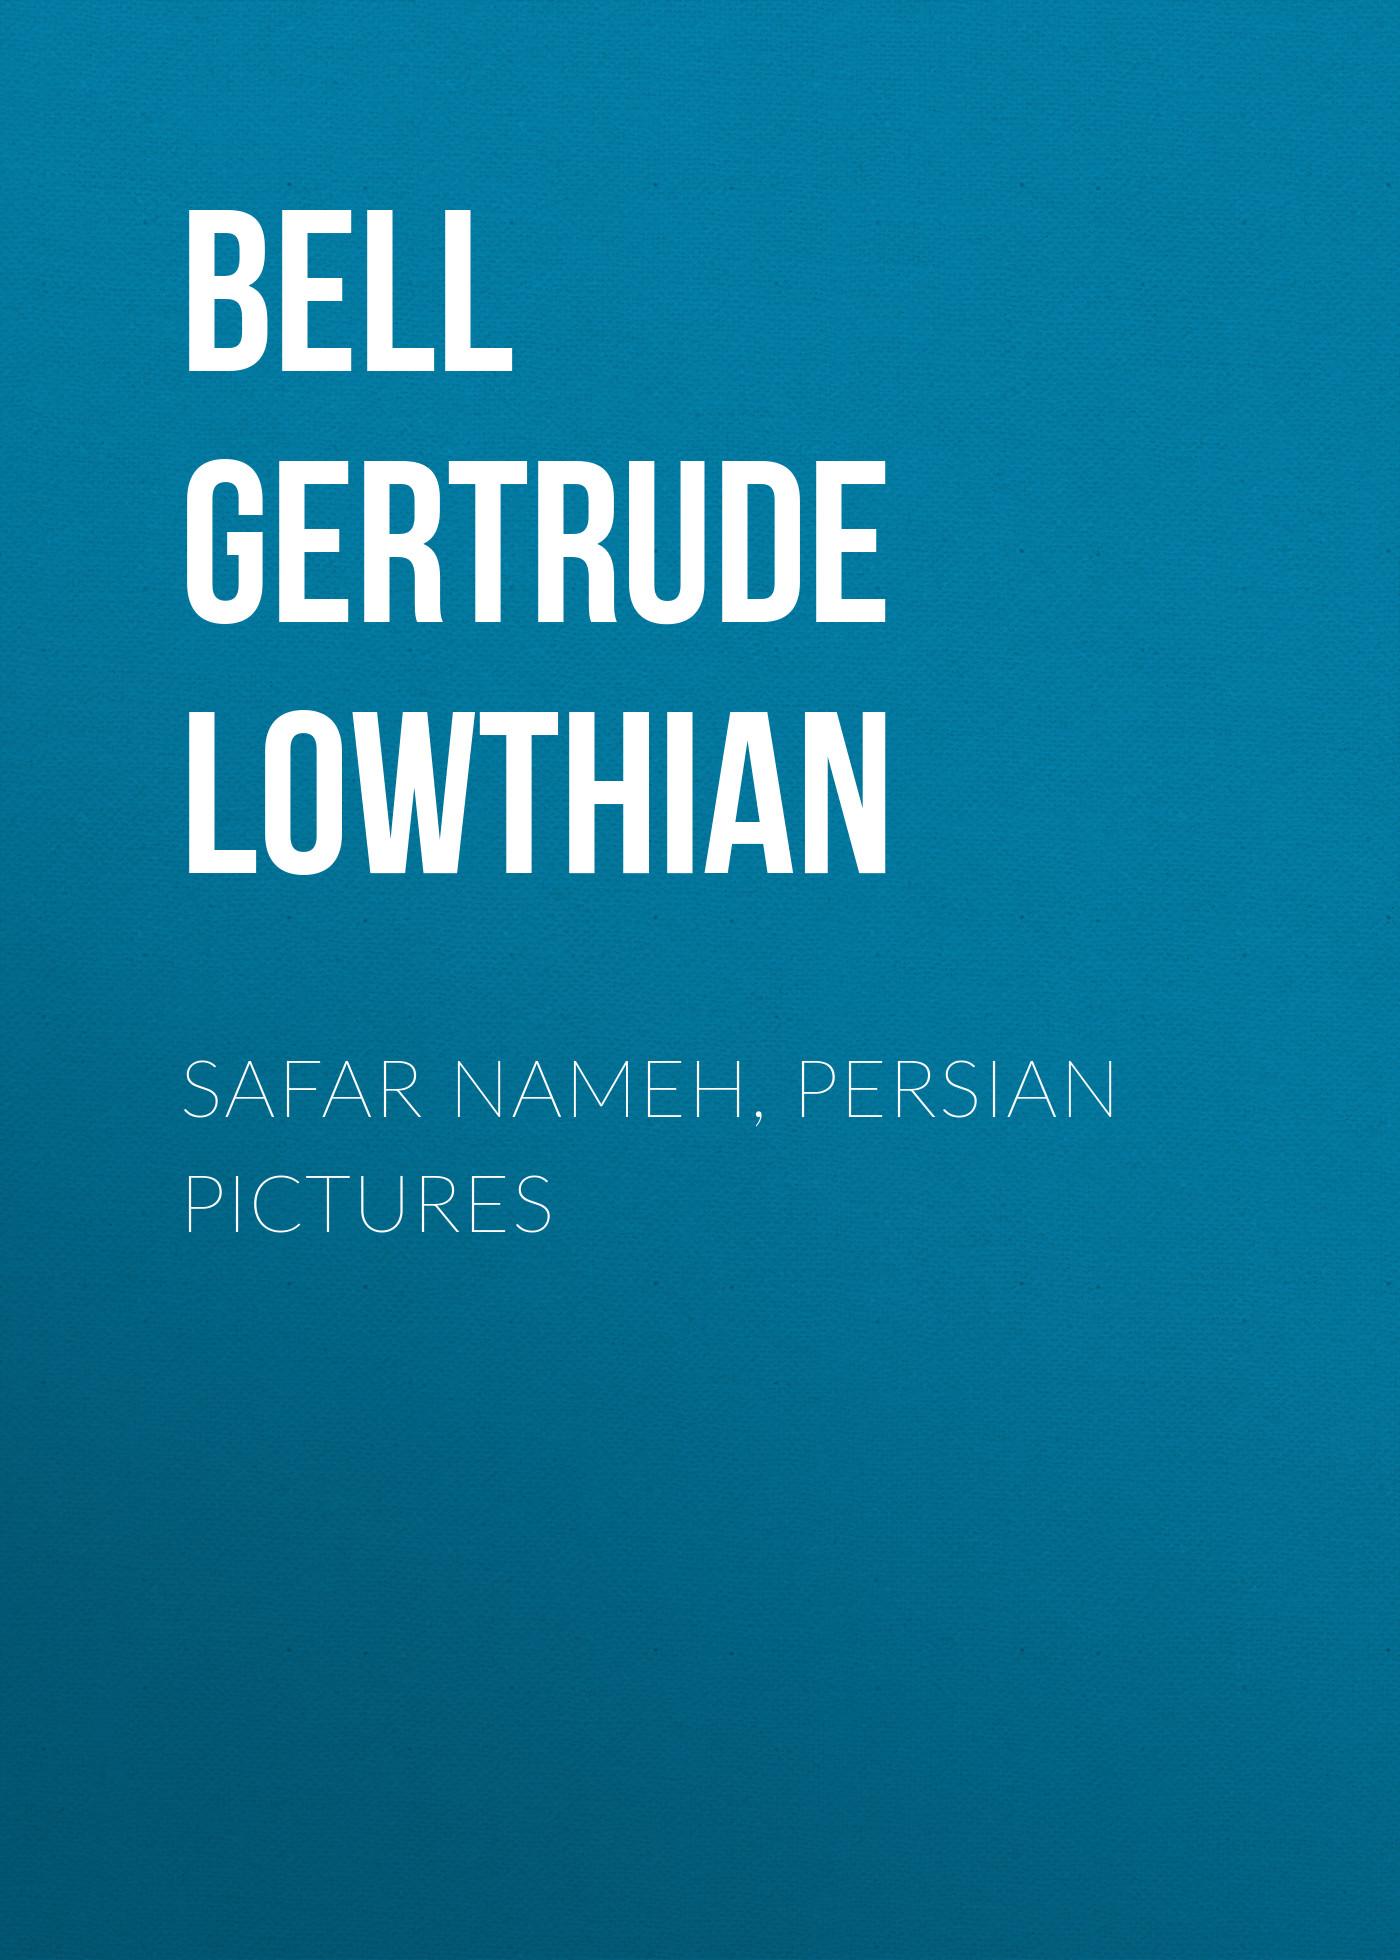 Bell Gertrude Lowthian Safar Nameh, Persian Pictures